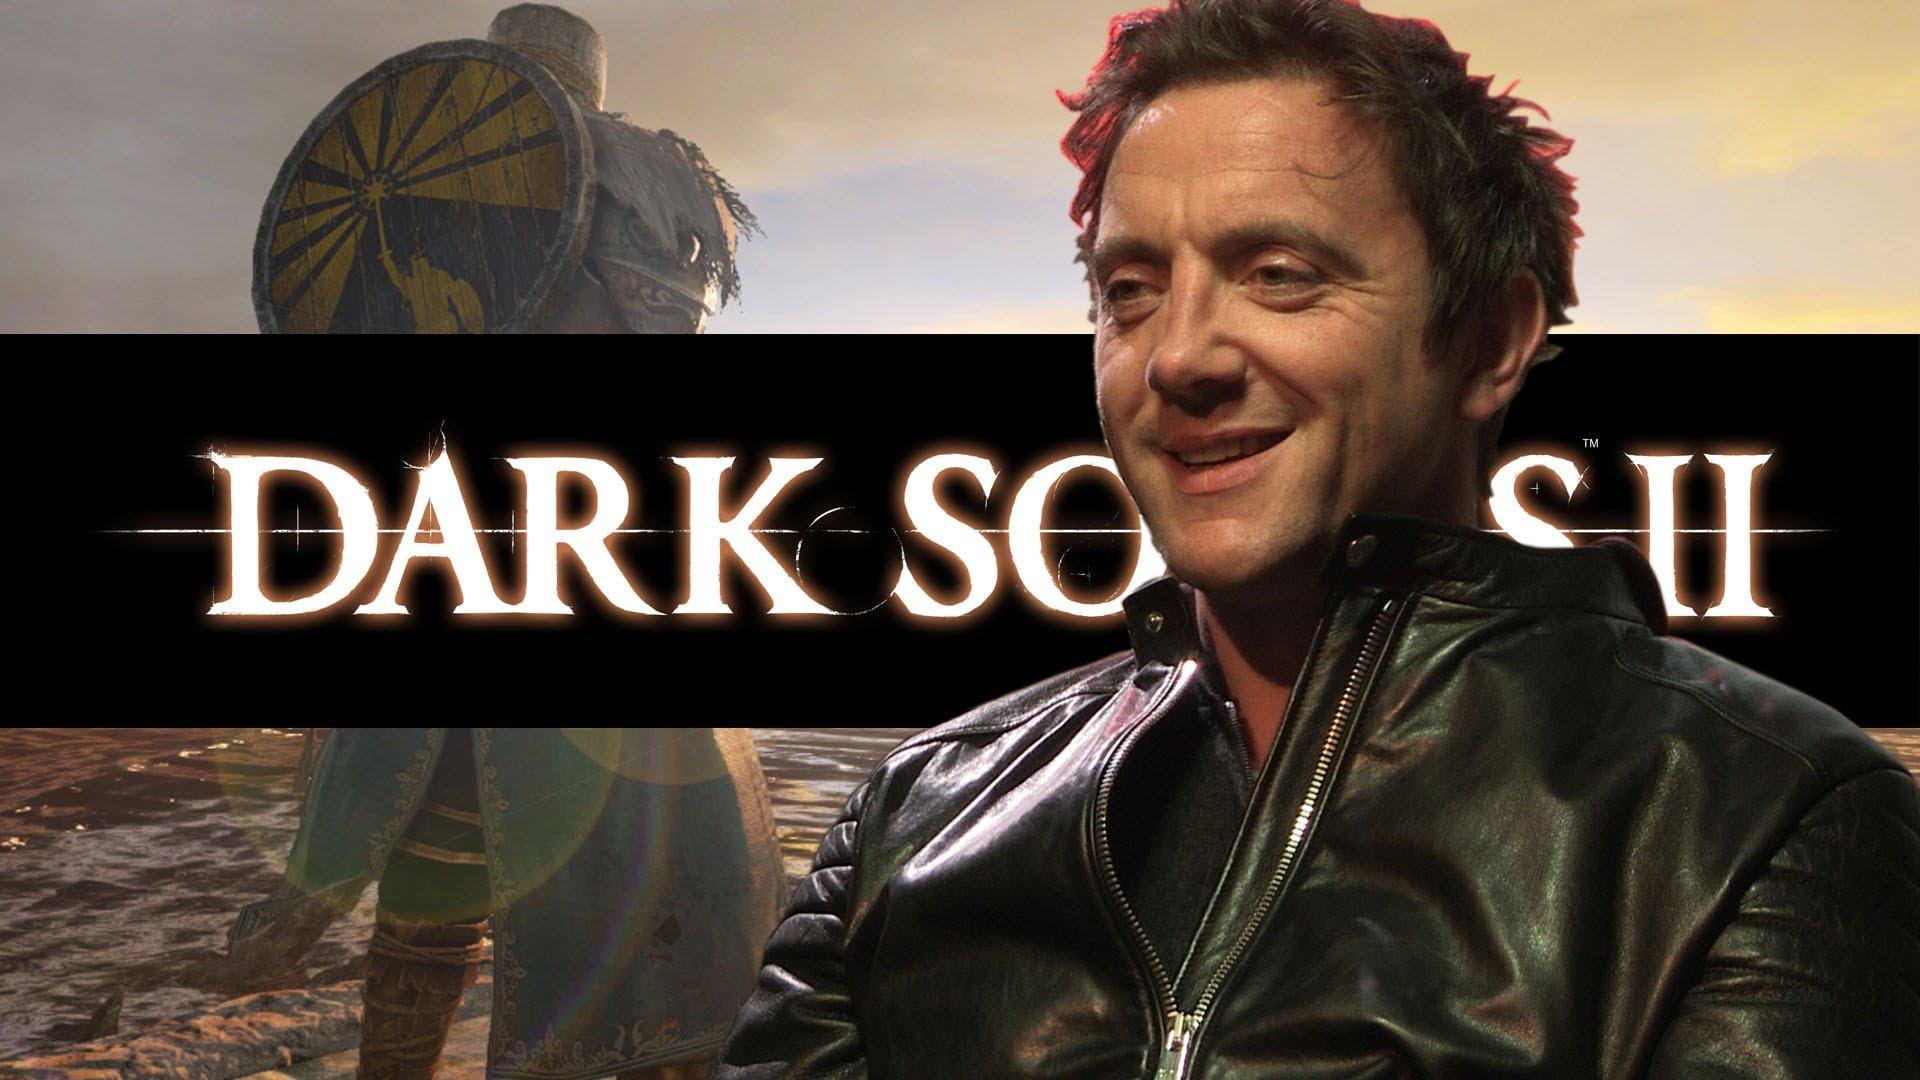 The Peter Serafinowicz Show: Season 1